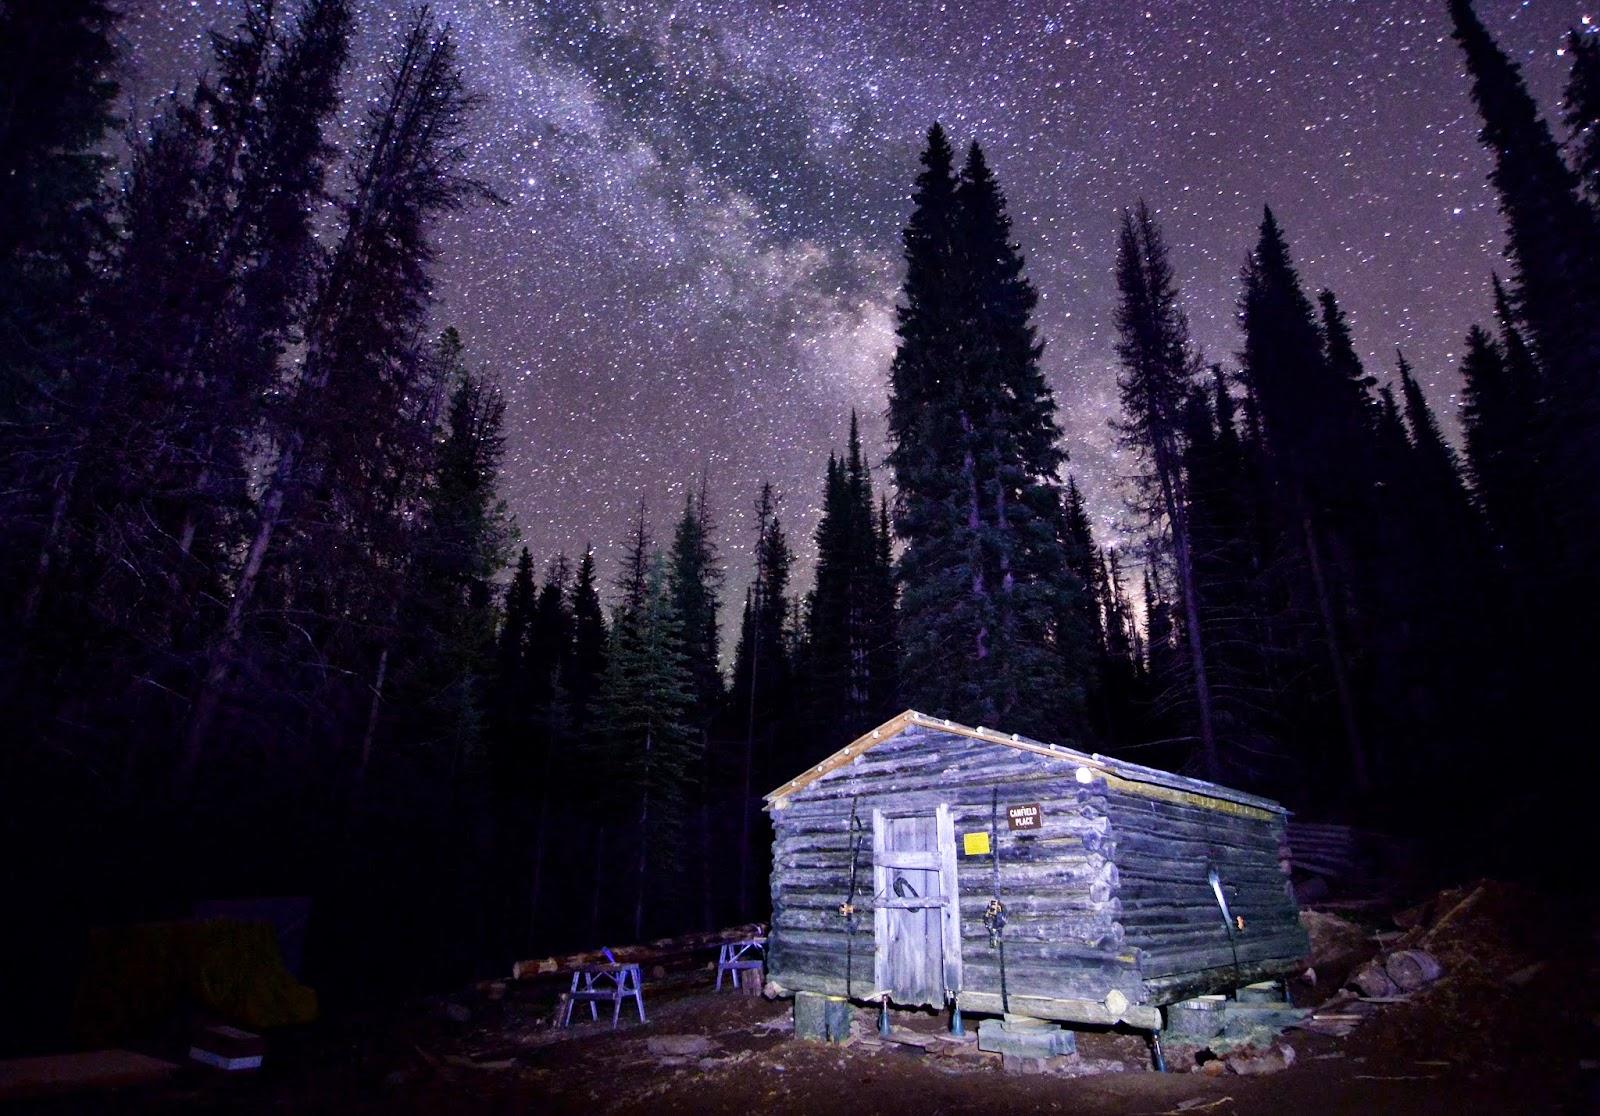 http://www.lohrphoto.com/Portfolio/After-Dark/16539749_tTgsdh#!i=3406219890&k=nmgn2Hf&lb=1&s=A